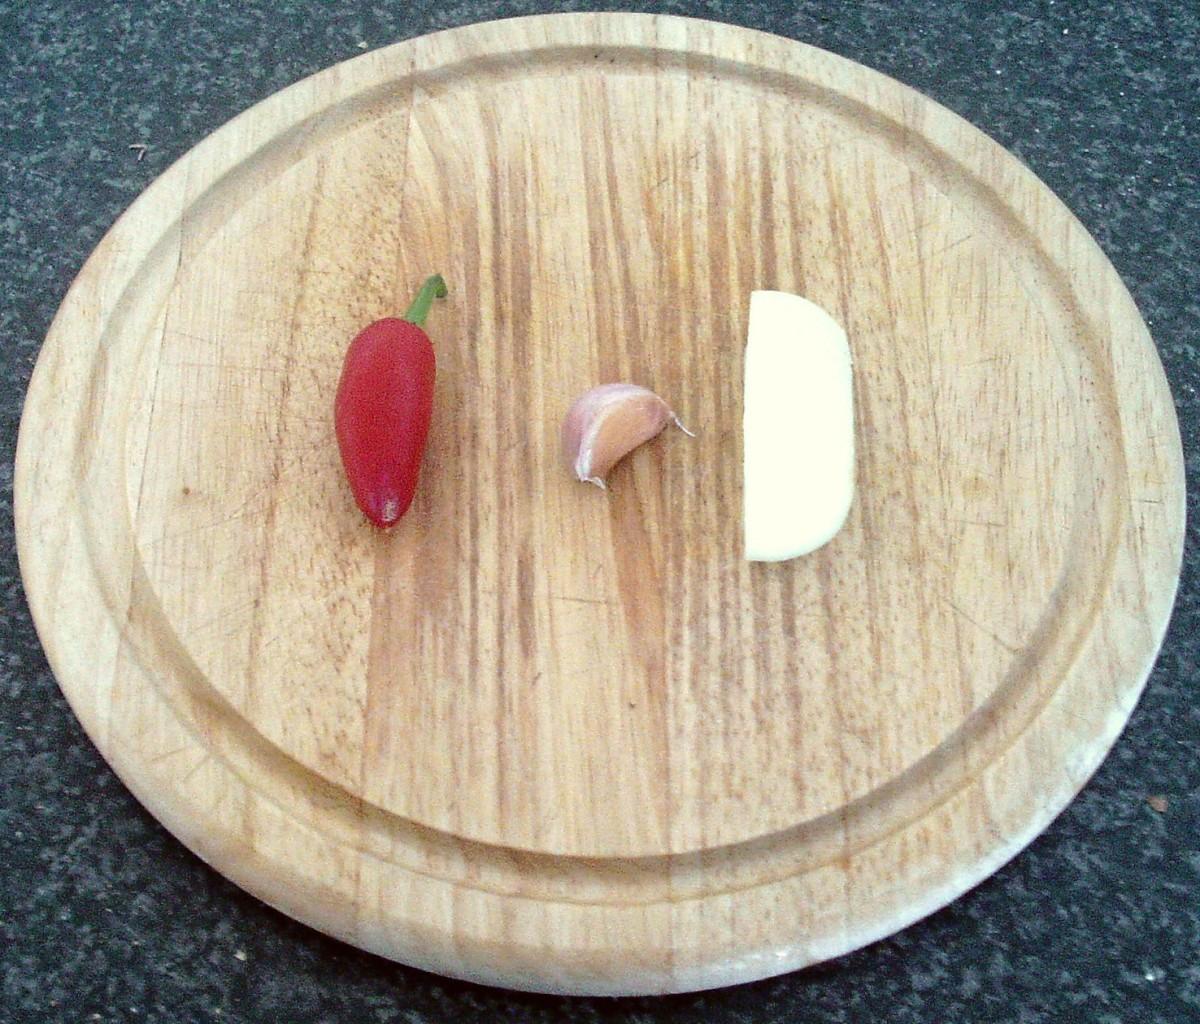 Chilli, garlic and onion